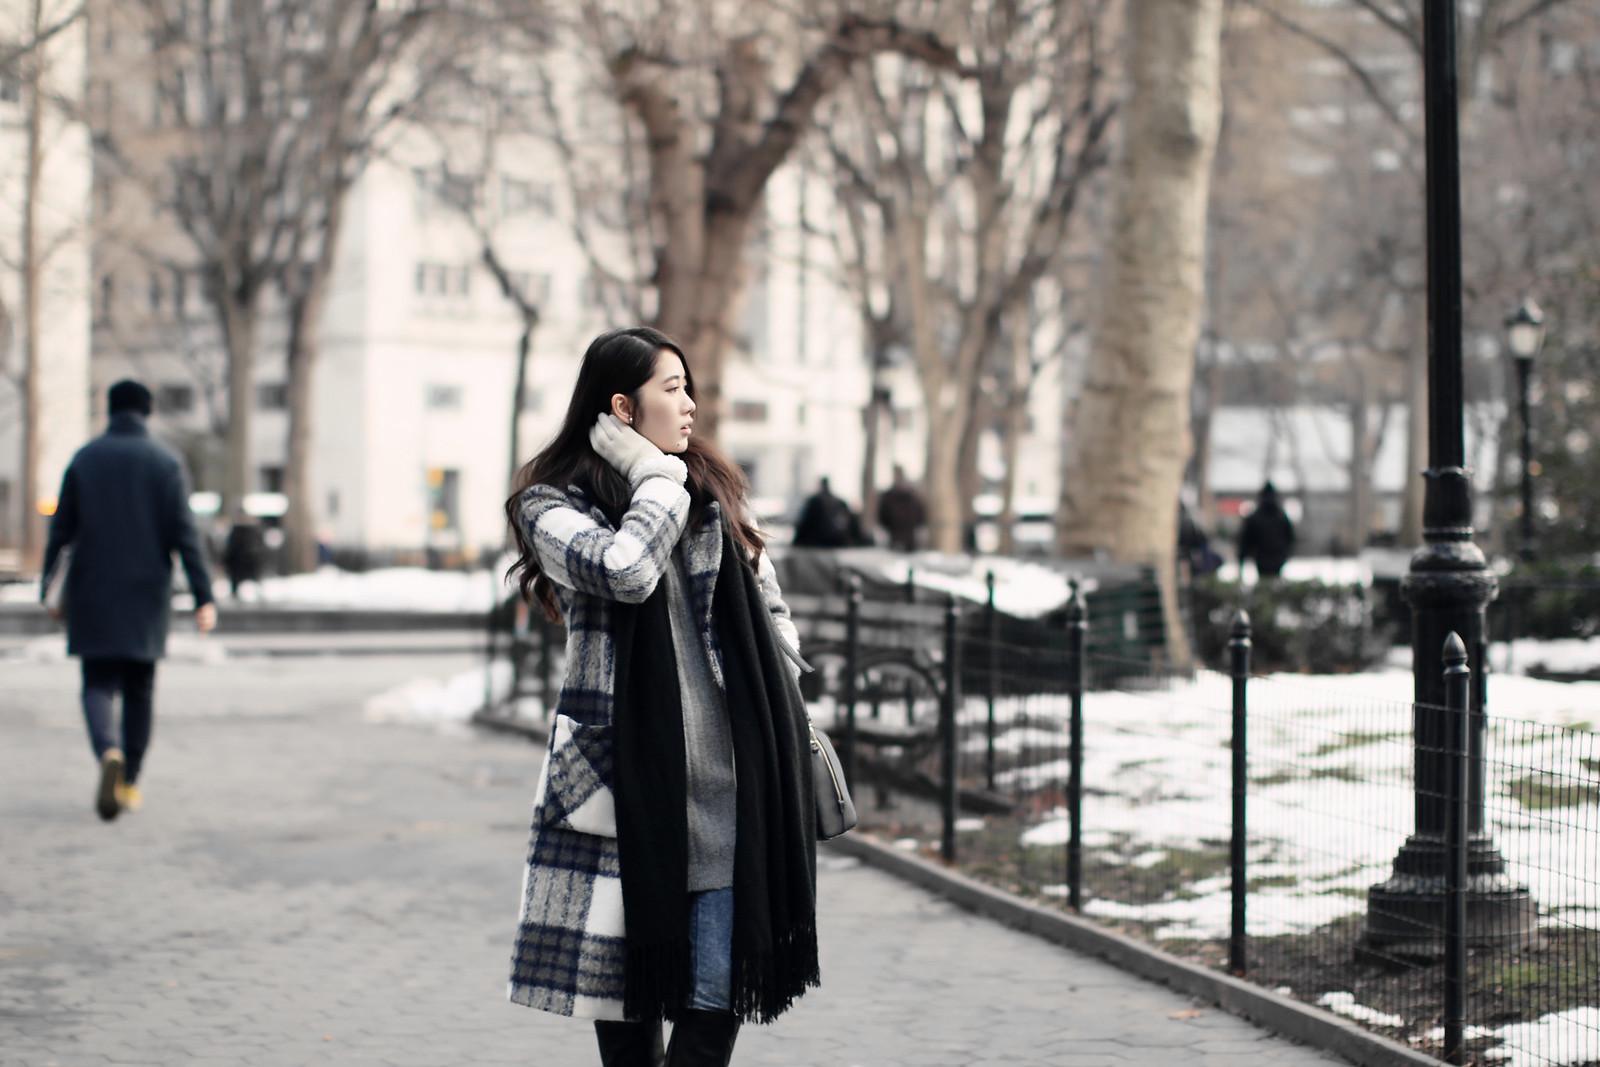 2080-clothestoyouuu-elizabeeetht-nyfw-newyorkfashionweek-nyc-fashionweek-newyork- winter2017-fashion-ootd